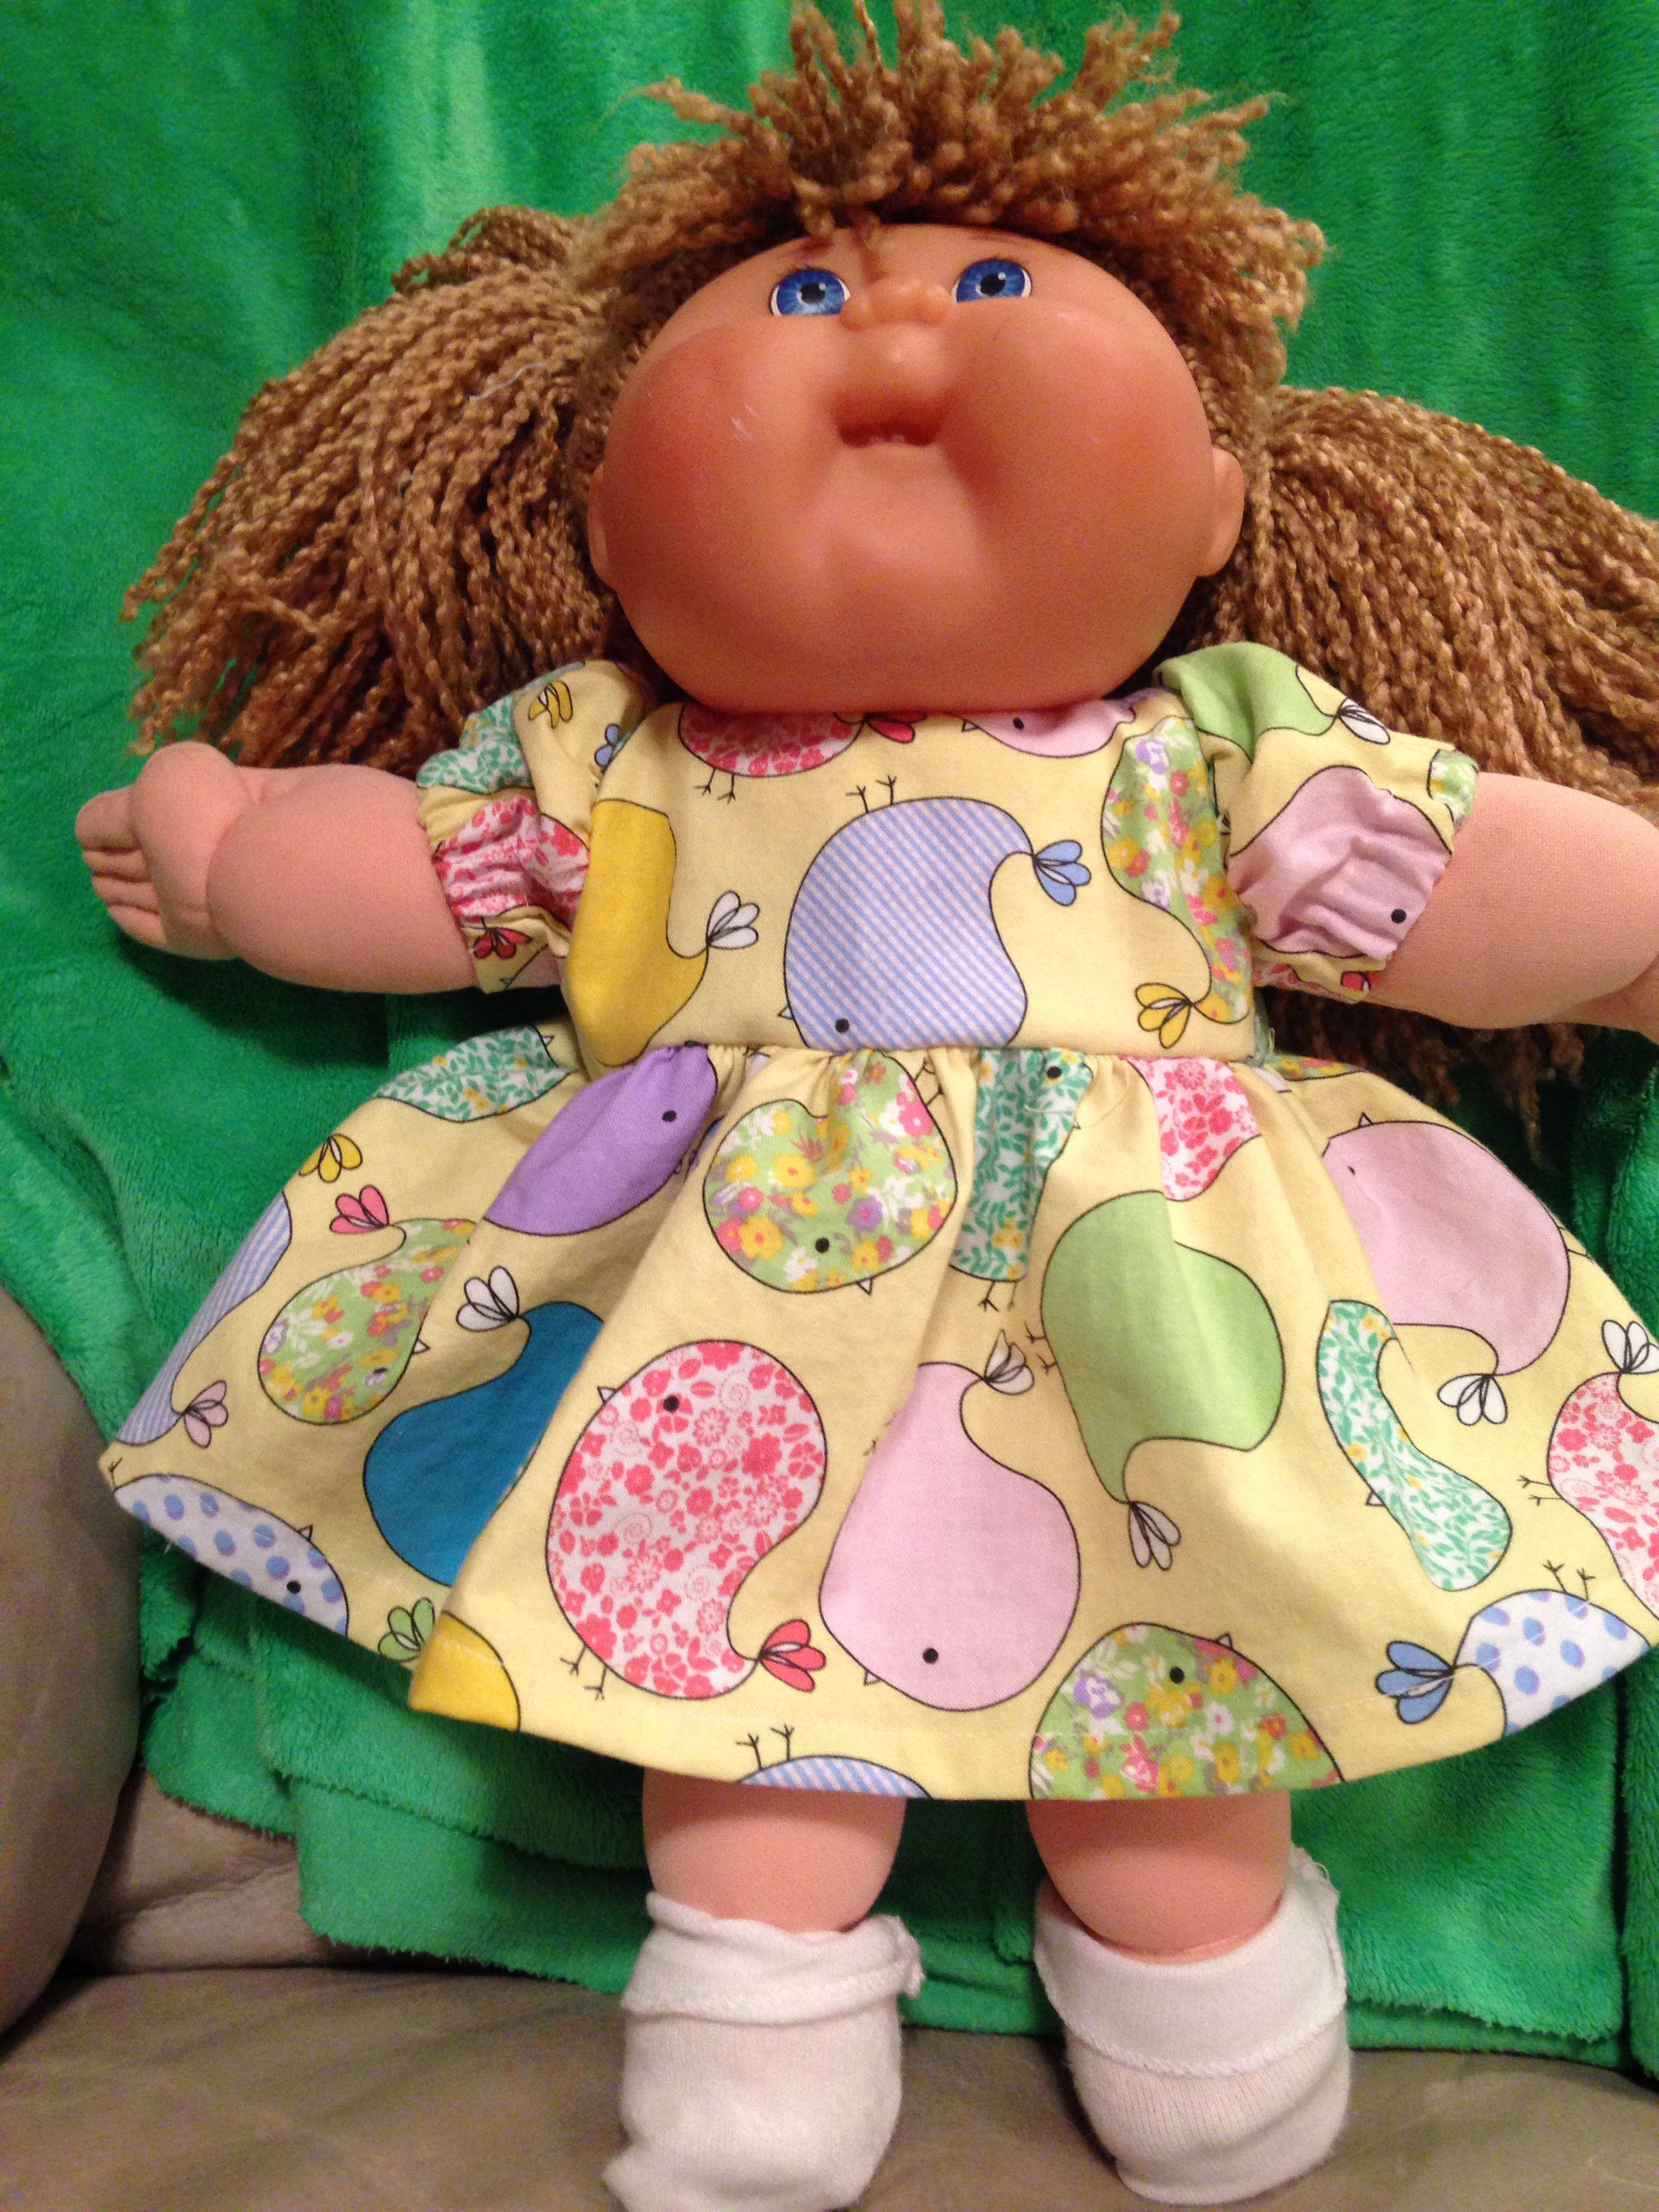 Doll dress / cabbage patch clothes | Stuff I\'ve made - glitterdotsok ...